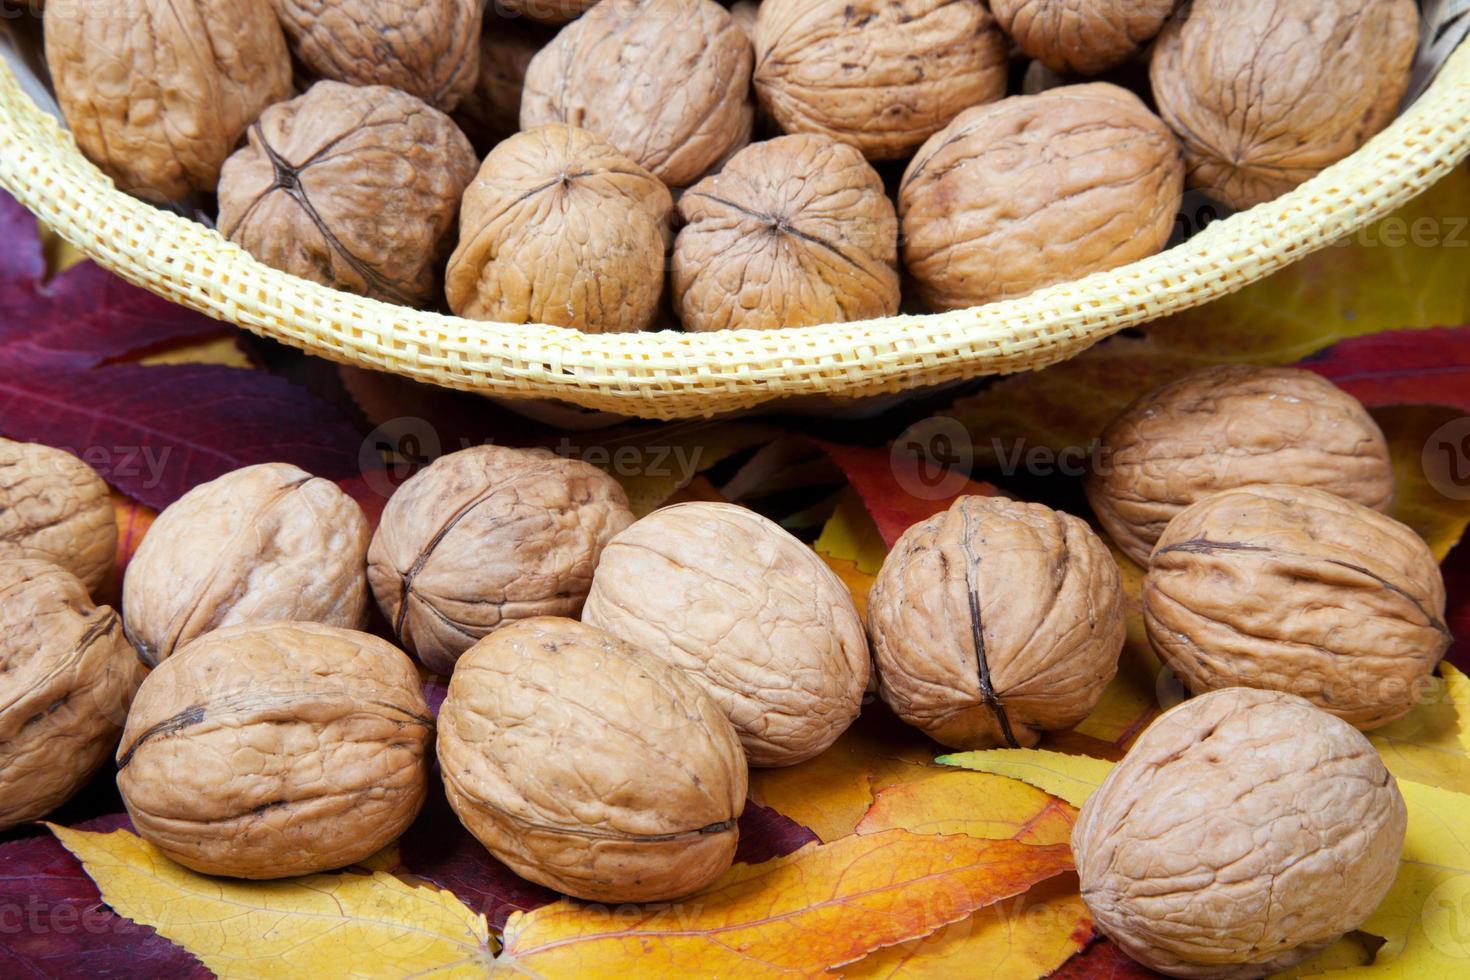 Walnuts close-up photo